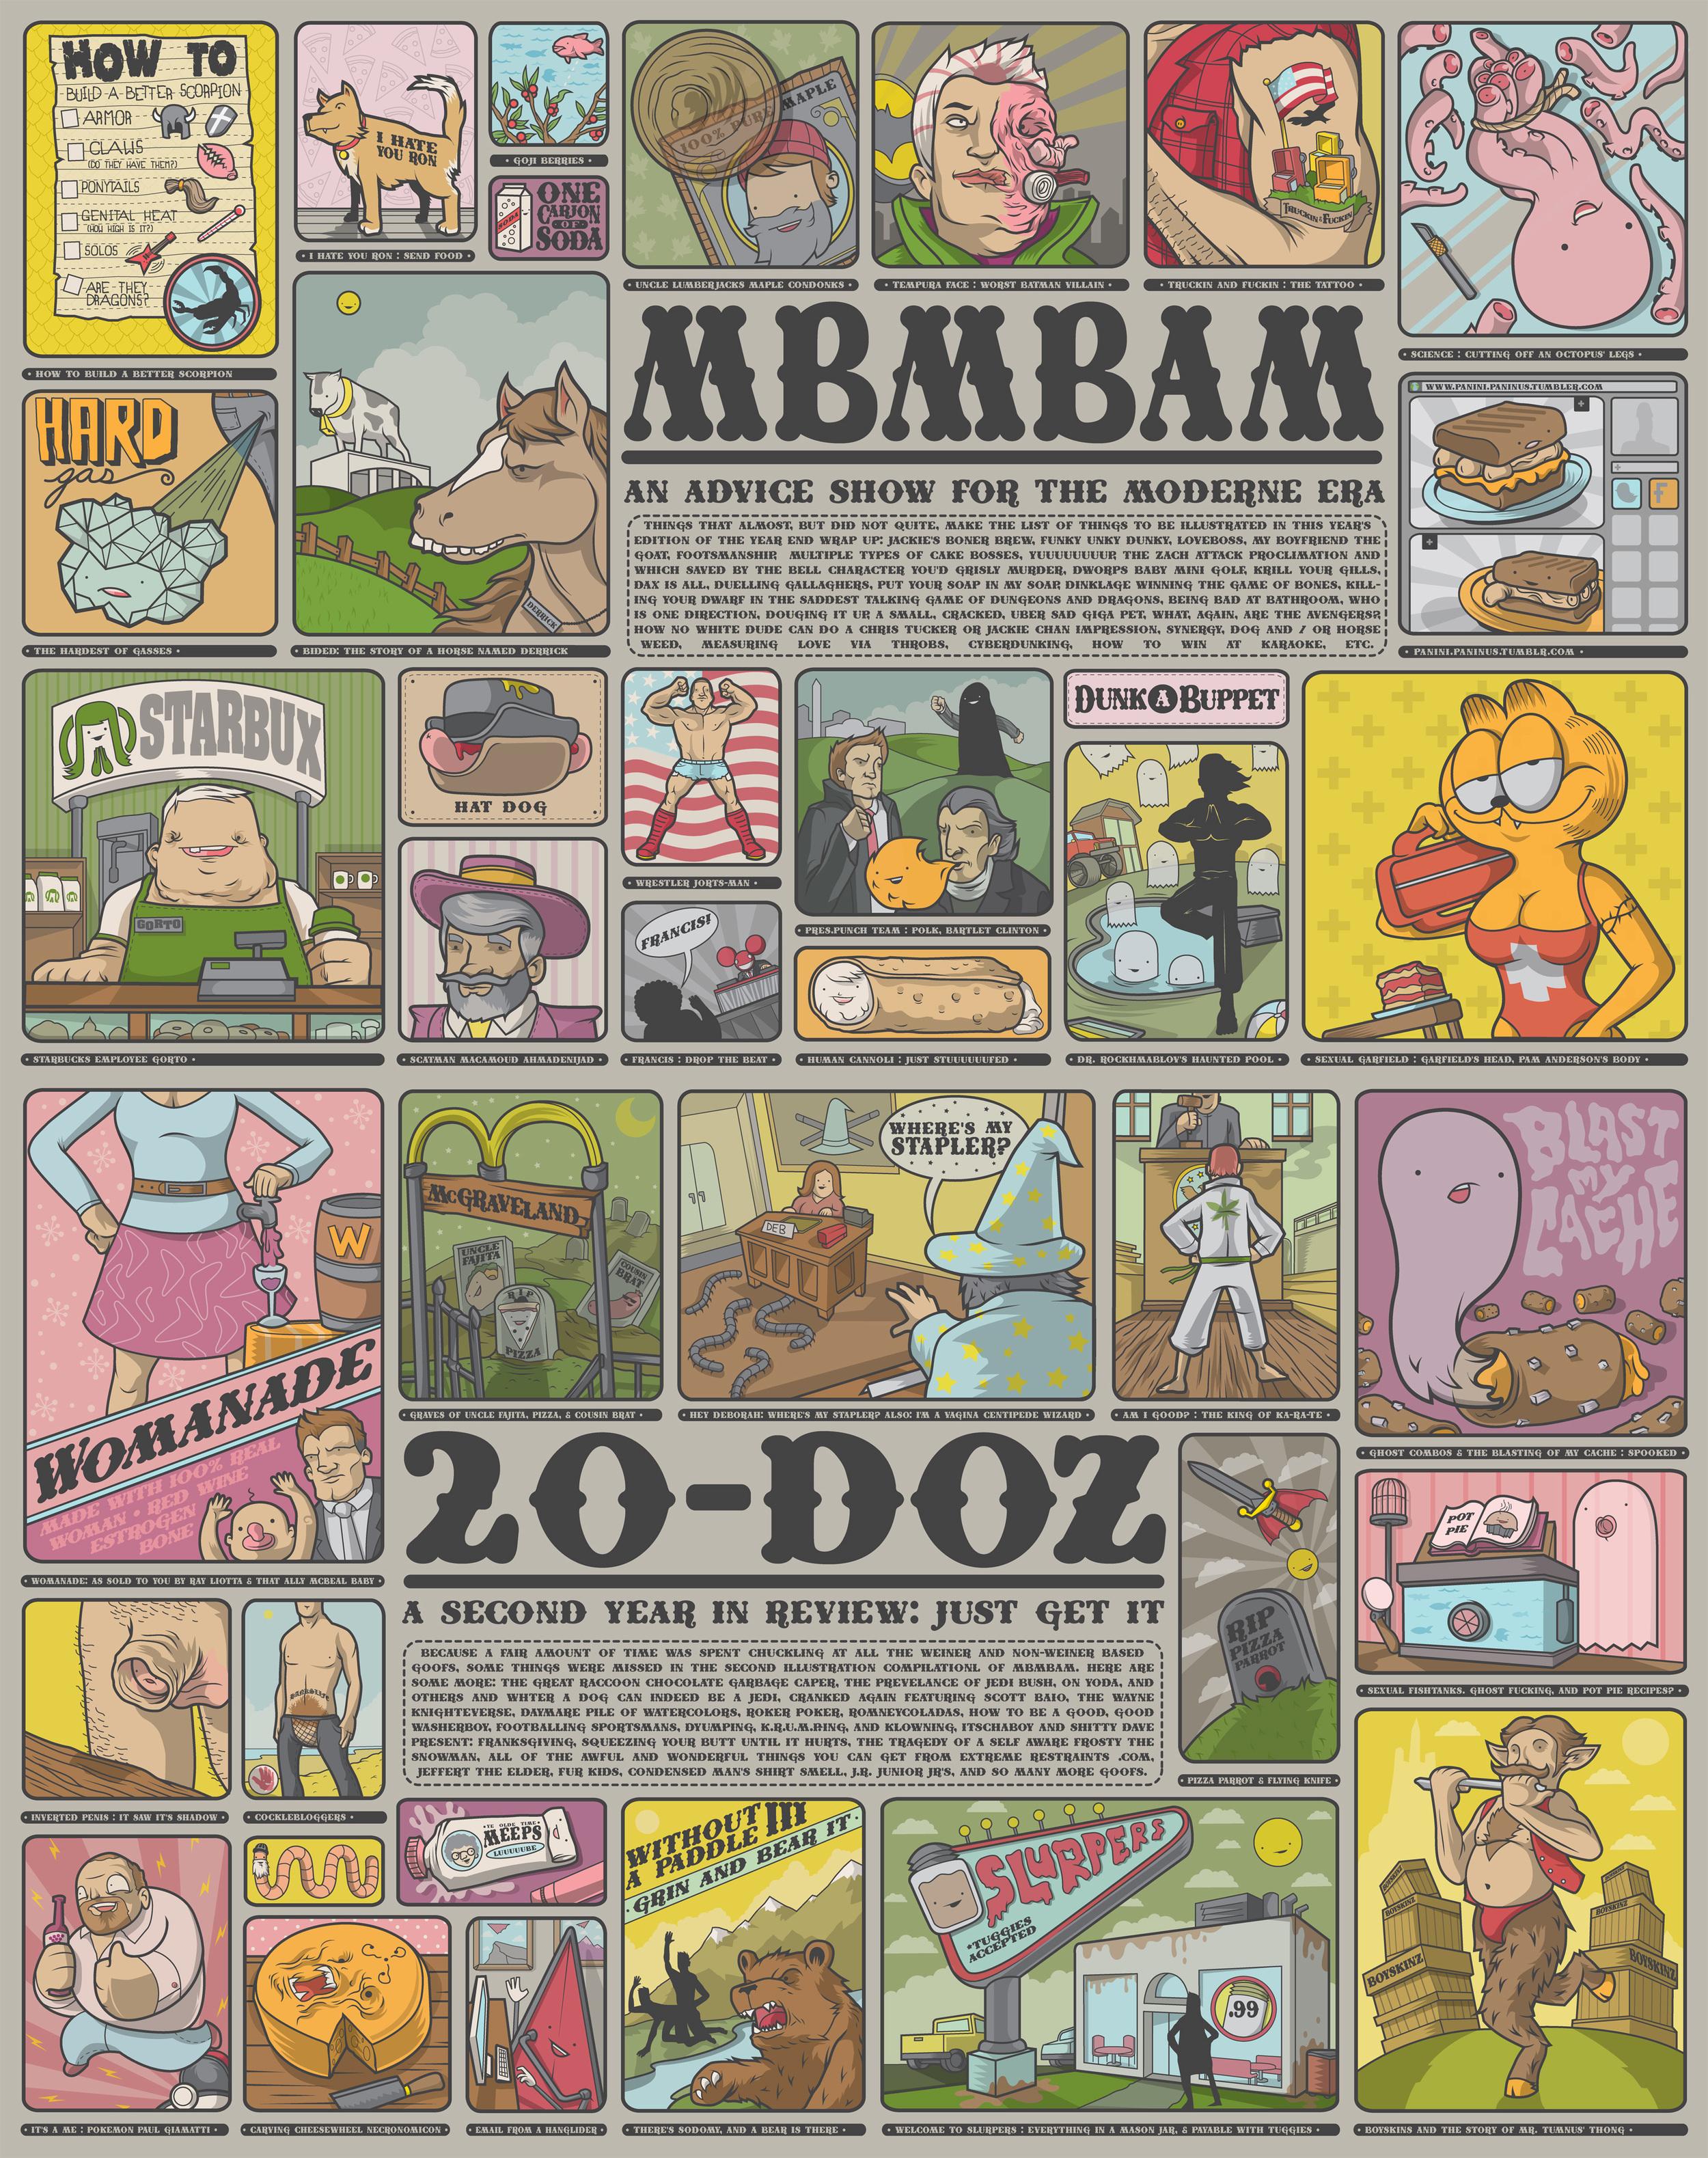 MBMBAM_2_Get_It_20_Doz.jpg